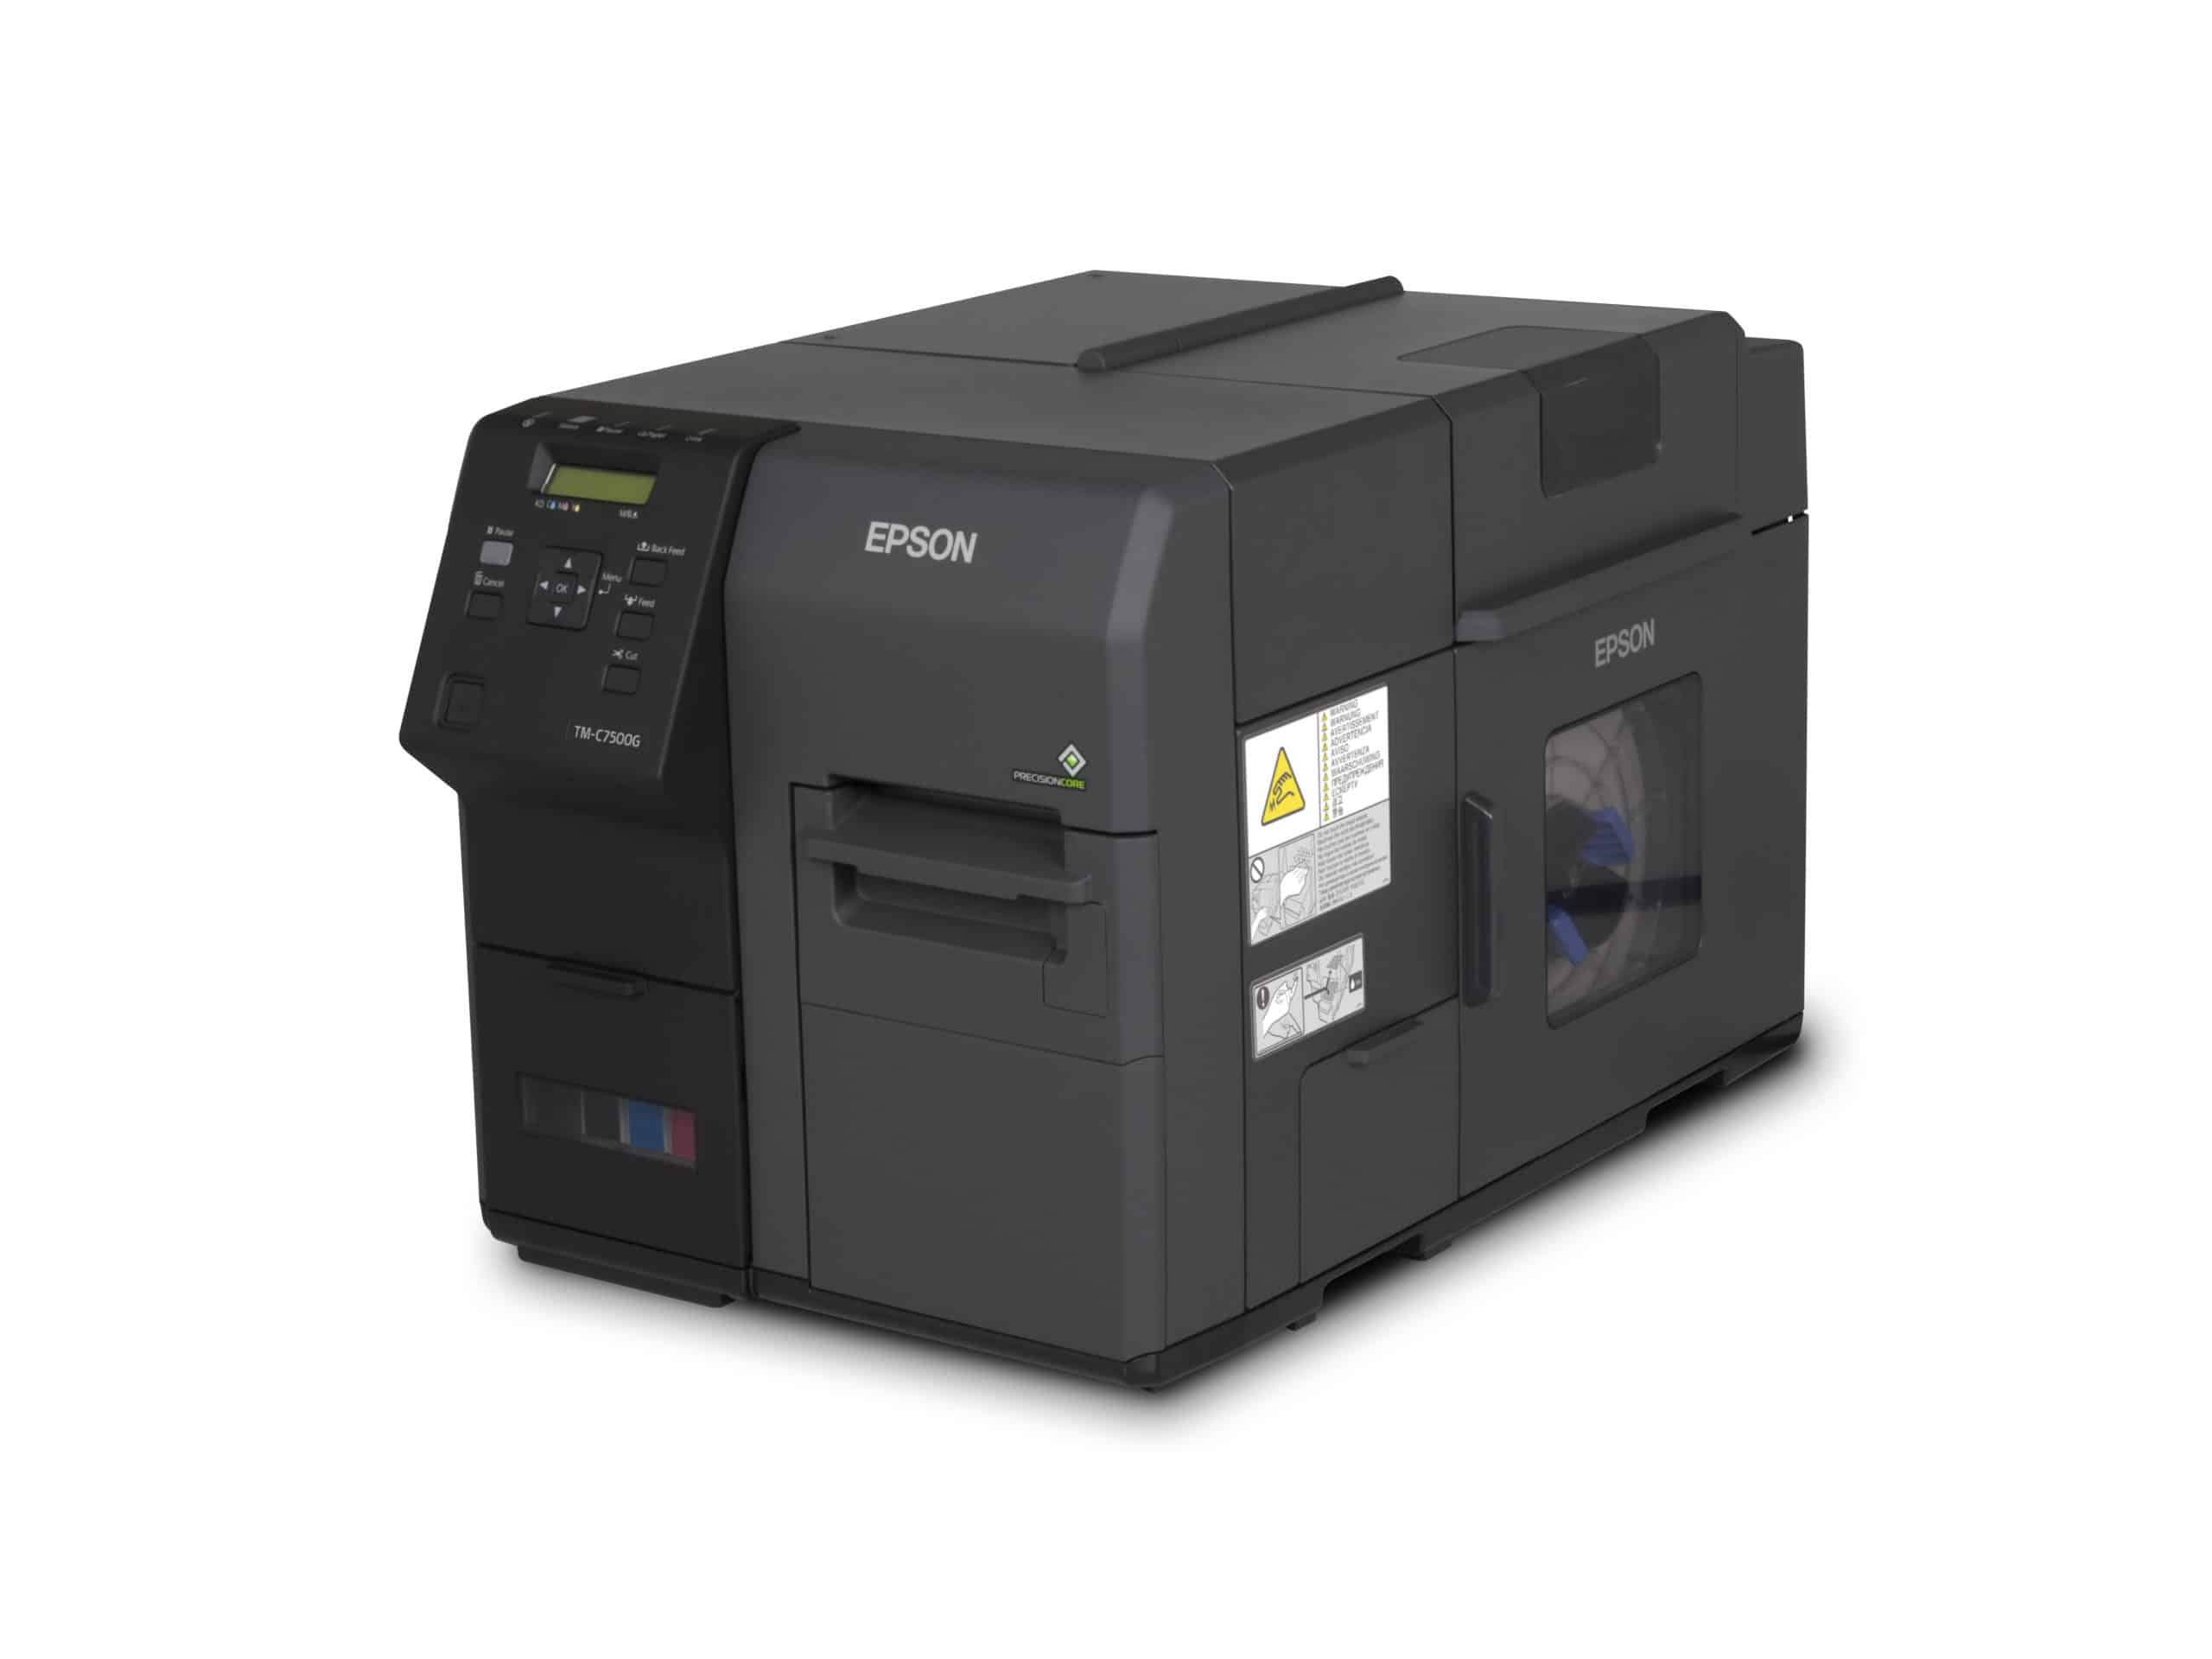 Shop Epson C7500 ColorWorks Color Label Printer at LabelBasic